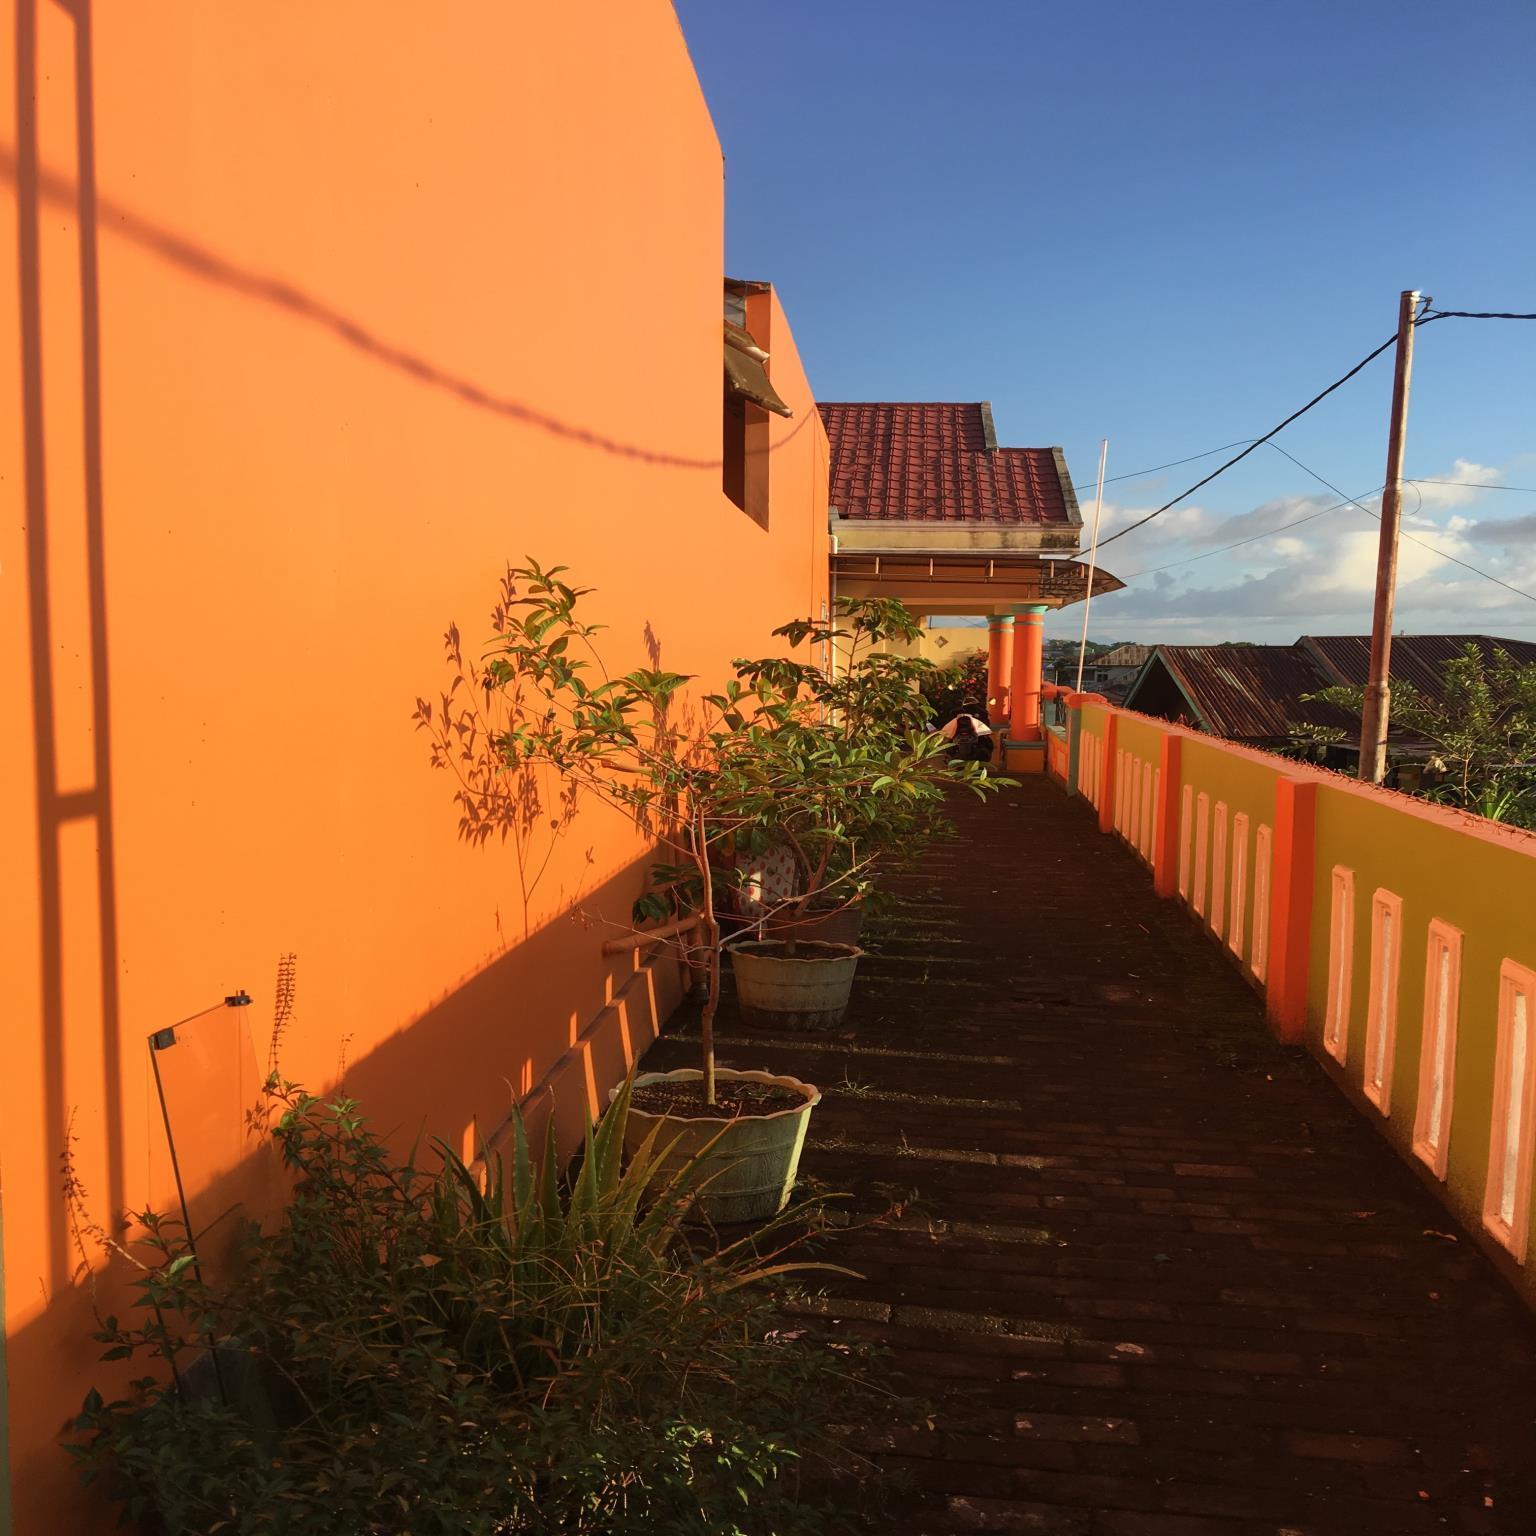 Hotel Aini Homestay - jl toboleu koloncucu gypsi no 45 rt 16 rw 06 - Ternate